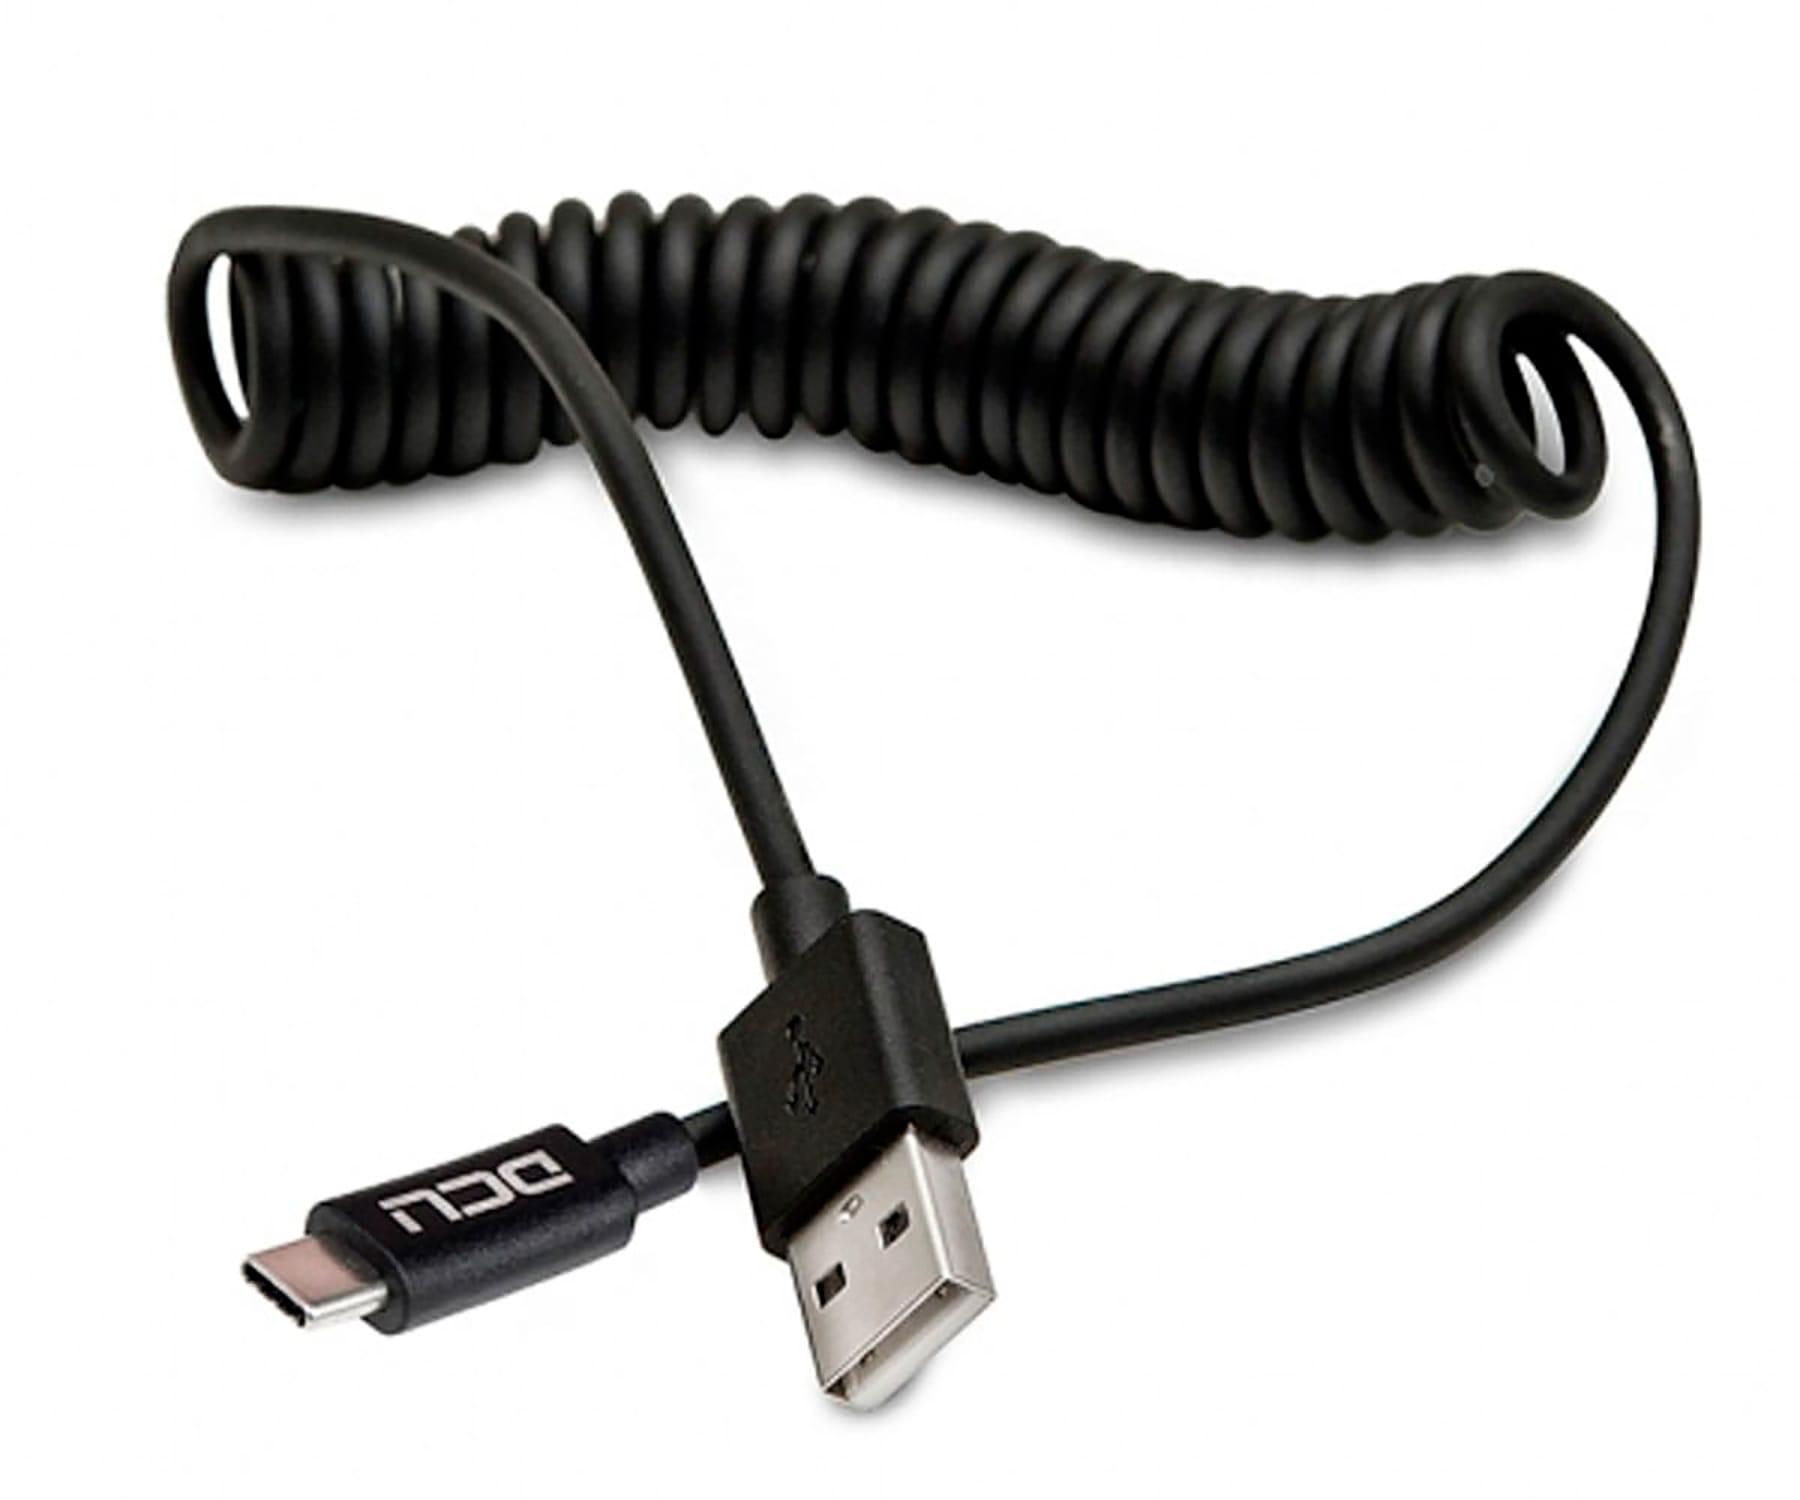 DCU NEGRO CABLE RIZADO USB TIPO A 2.0 A USB TIPO C 1,5 METROS